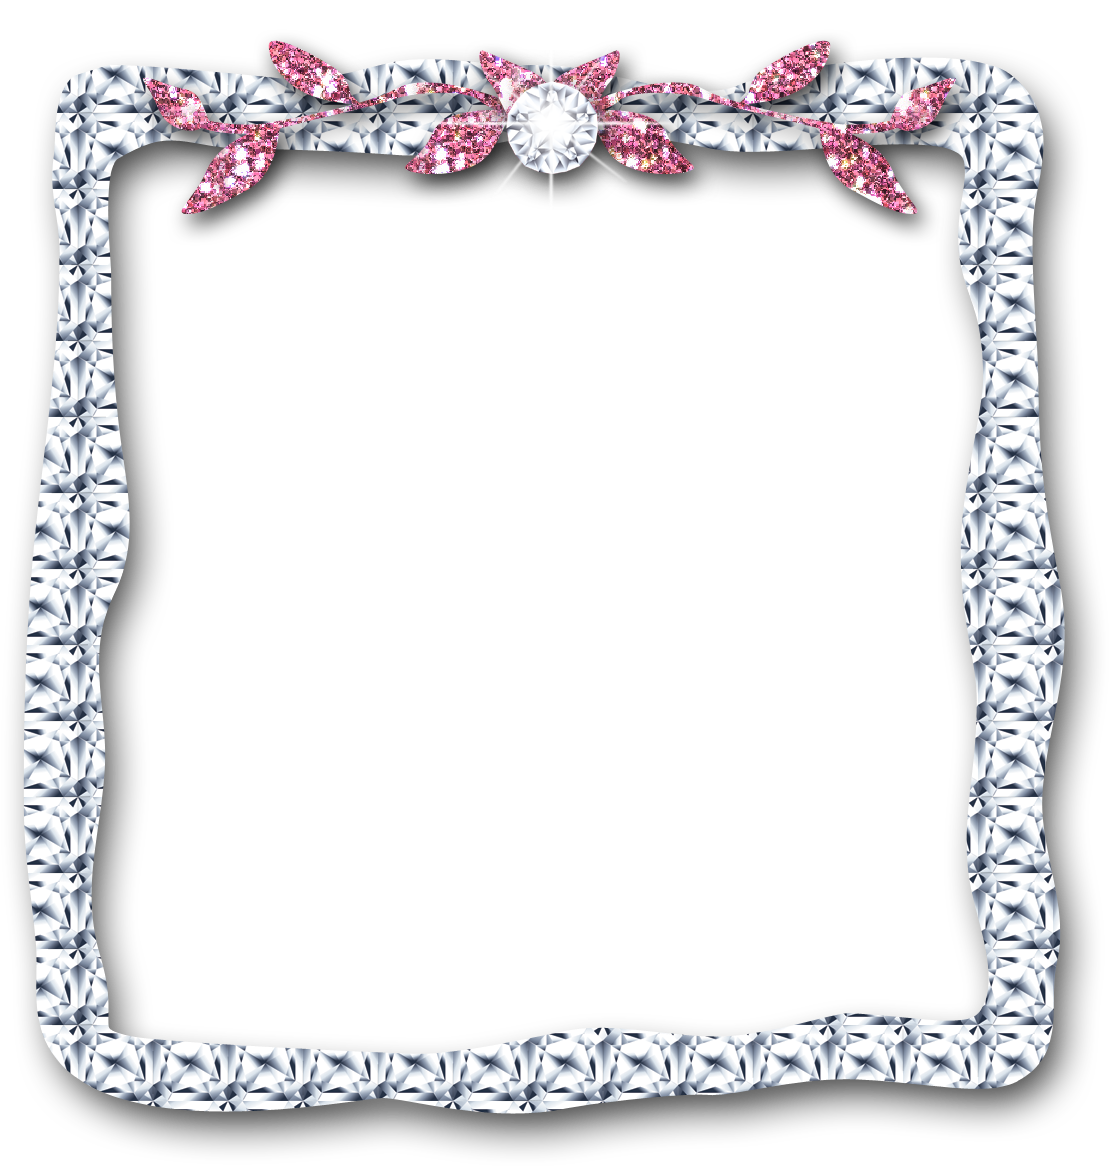 Hd crystals diamond outline. Diamonds clipart banner